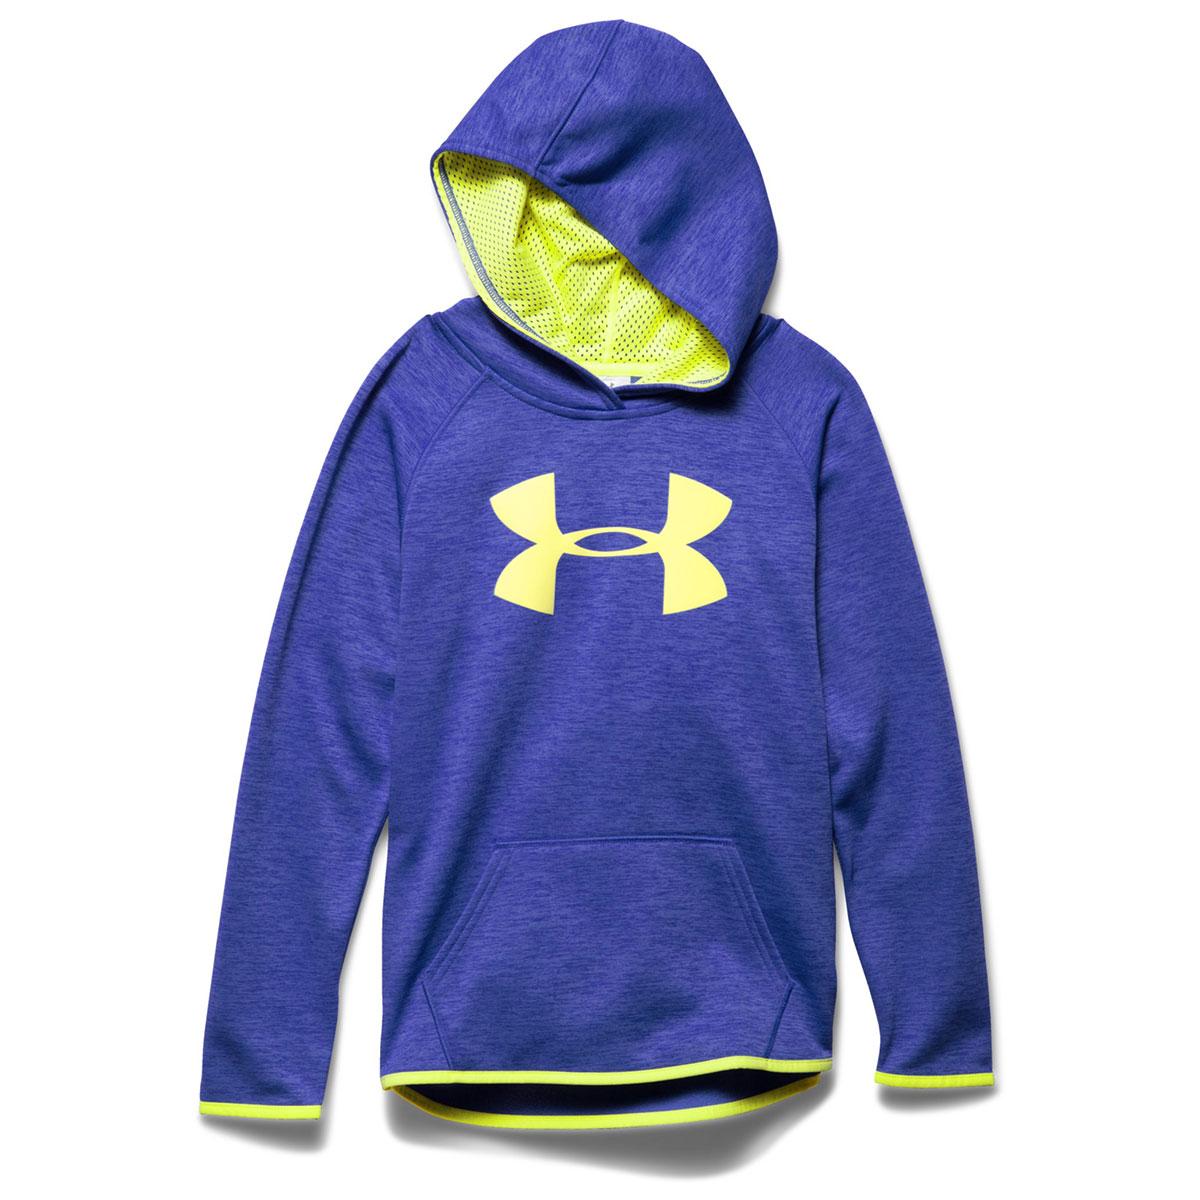 8478fdbd UNDER ARMOUR Girls' UA Armour Fleece Printed Big Logo Hoodie - Bob's ...